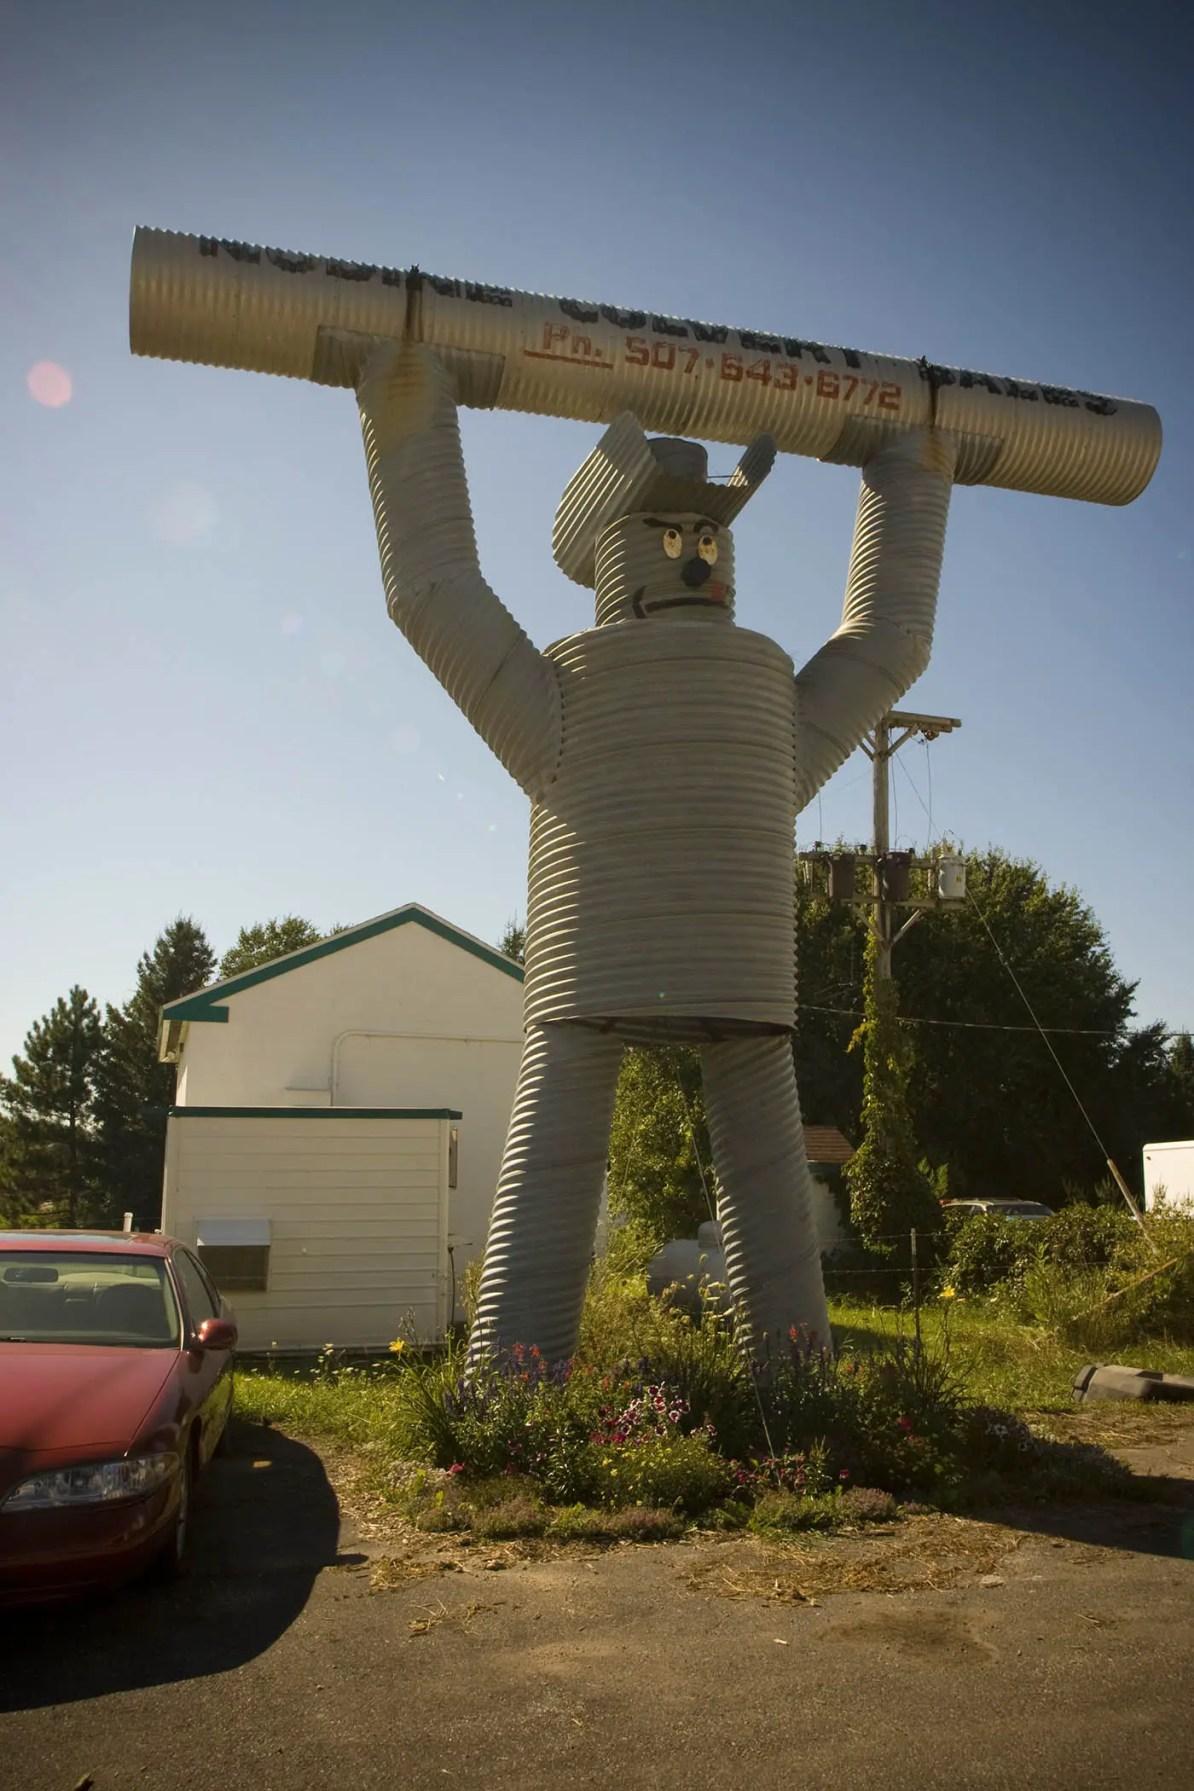 The Culvert Man in Nodine, Minnesota